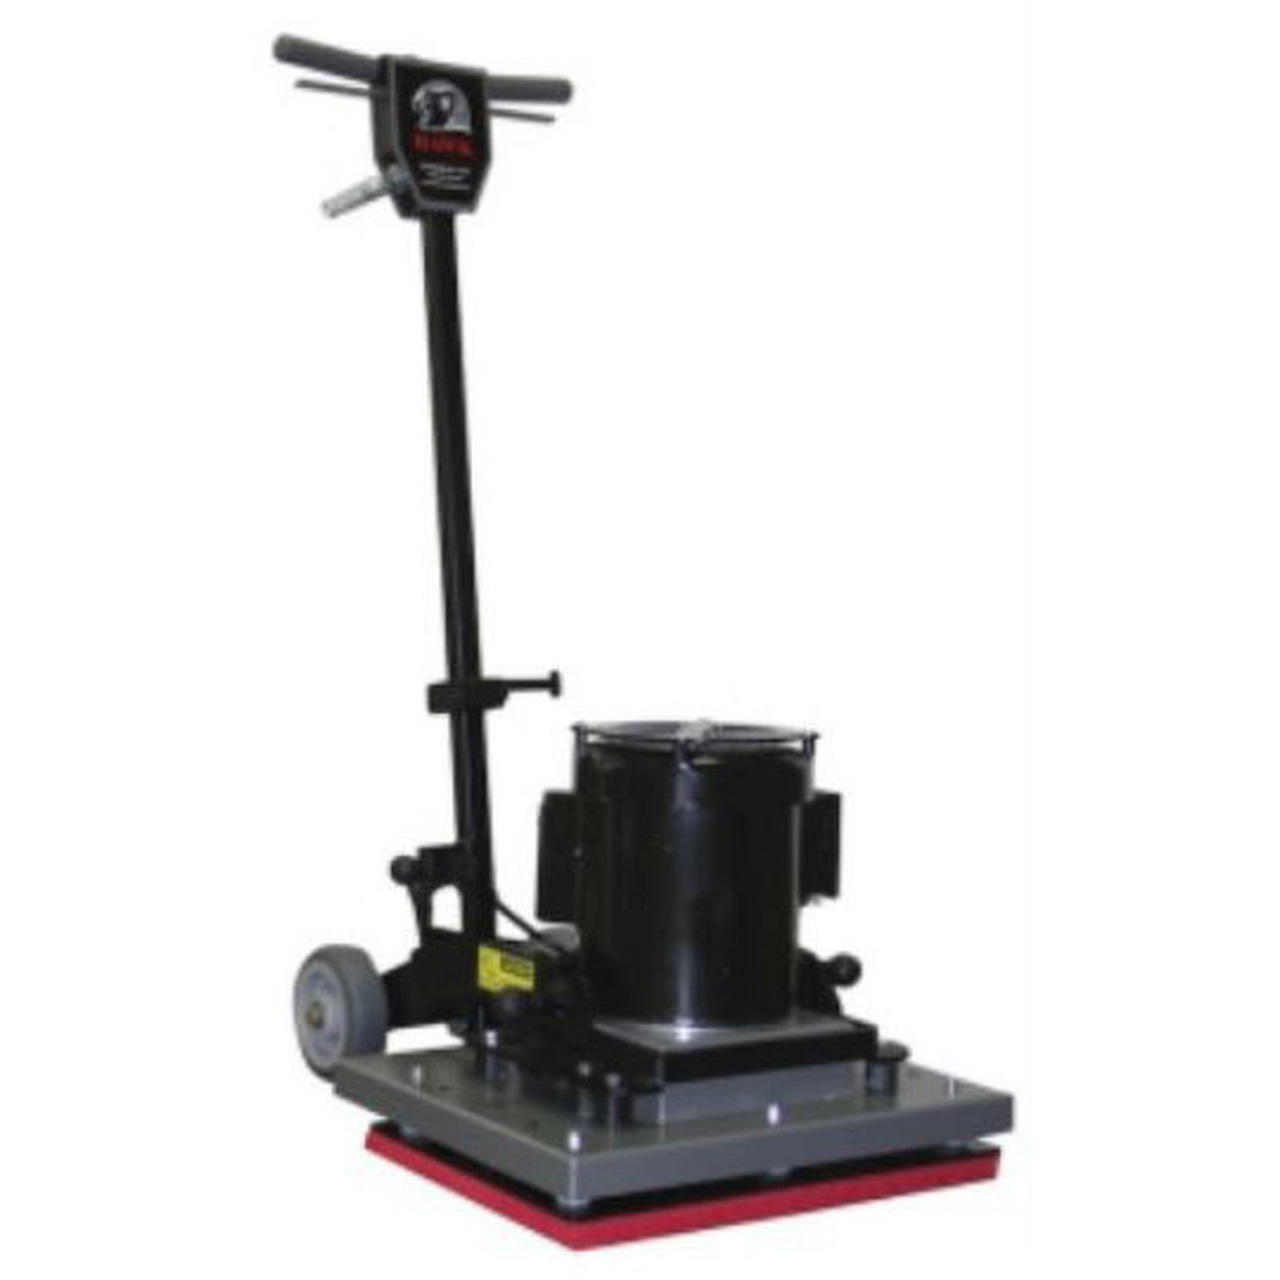 Hawk RedTail Orbital Floor Machine - 1725rpm F98-RT180